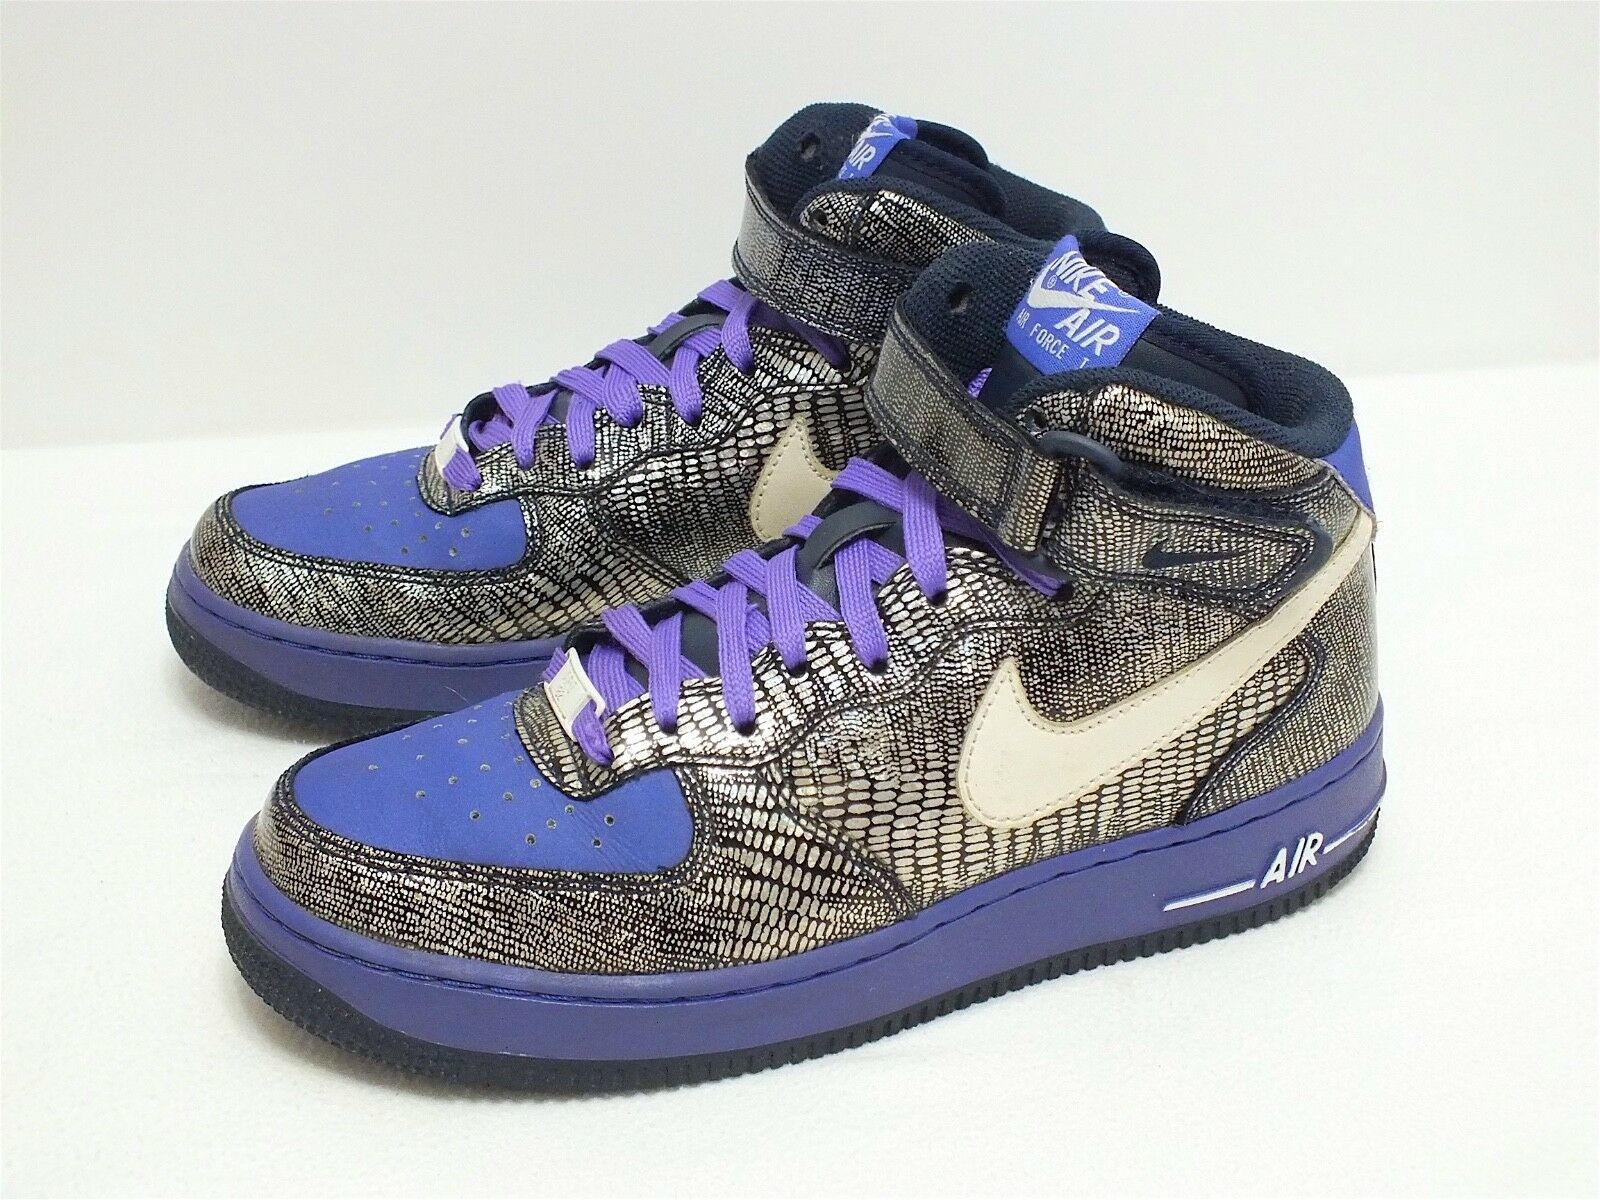 timeless design 74404 44dfa ... Nike air force ltd 1 2007 ltd force ed a metà del basket femminile le  scarpe ...